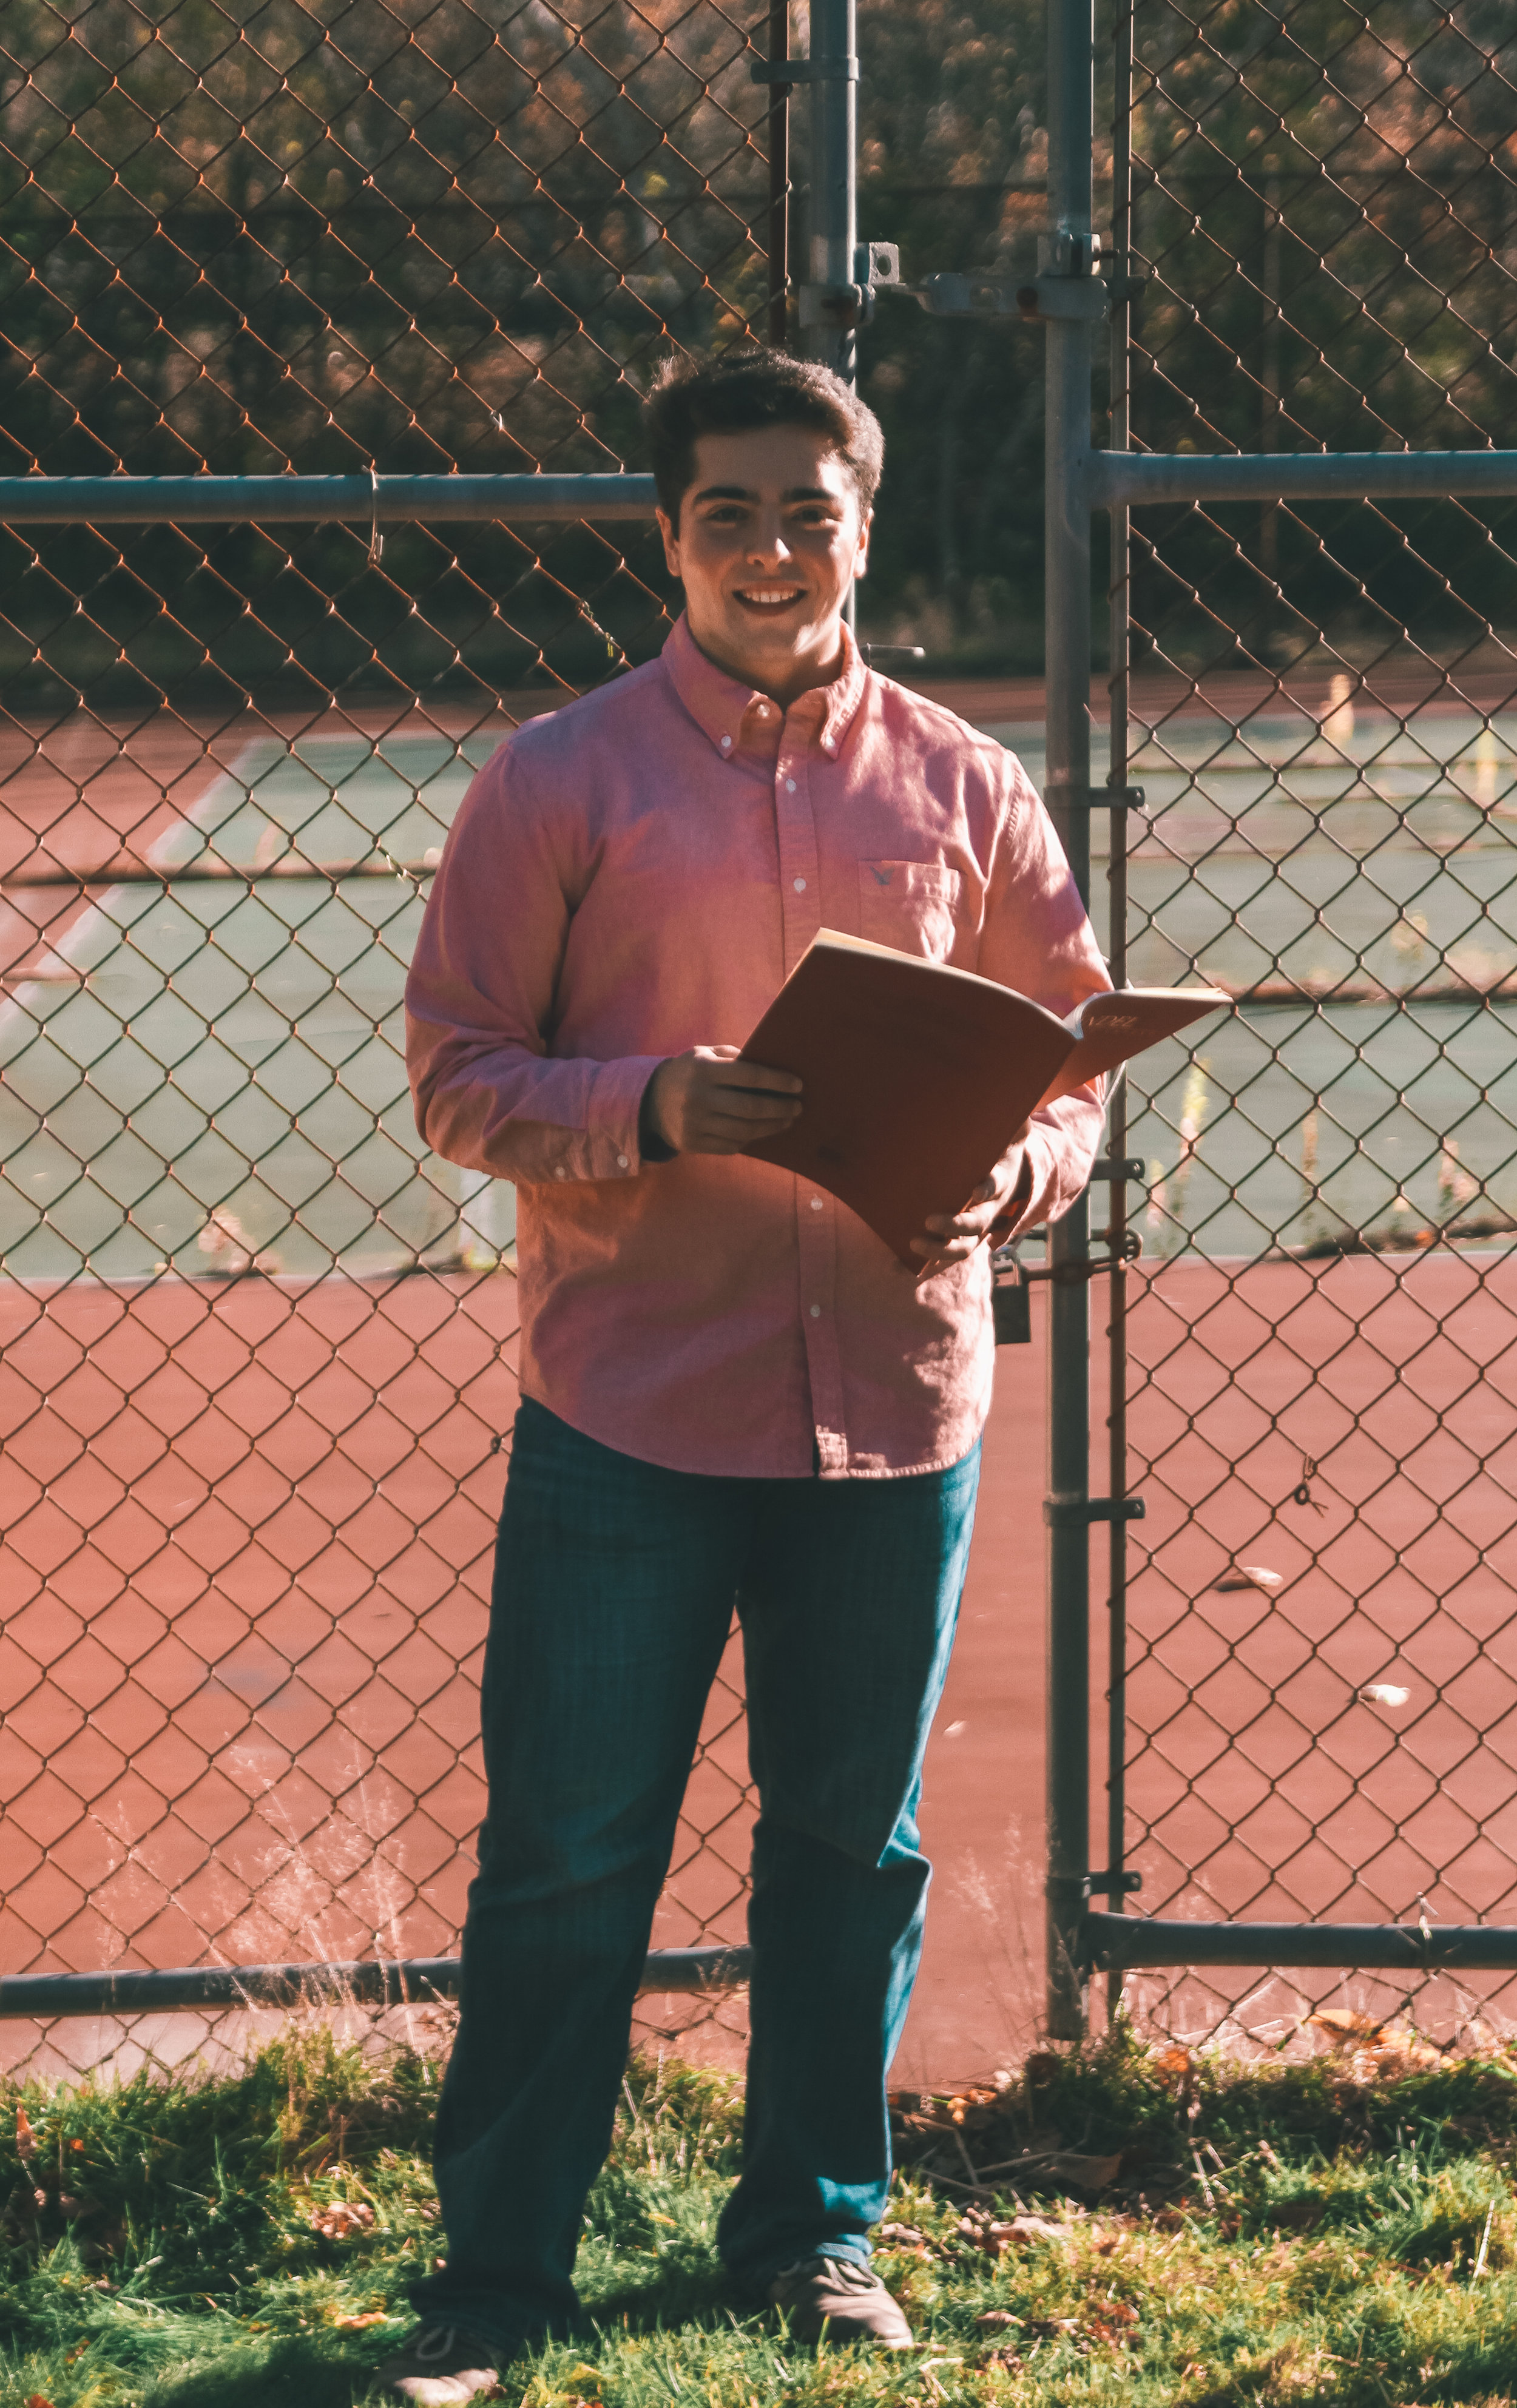 Travis Benoit, born in Worcester Massachusetts, Vocal Performance Major, Gordon College baseball player.